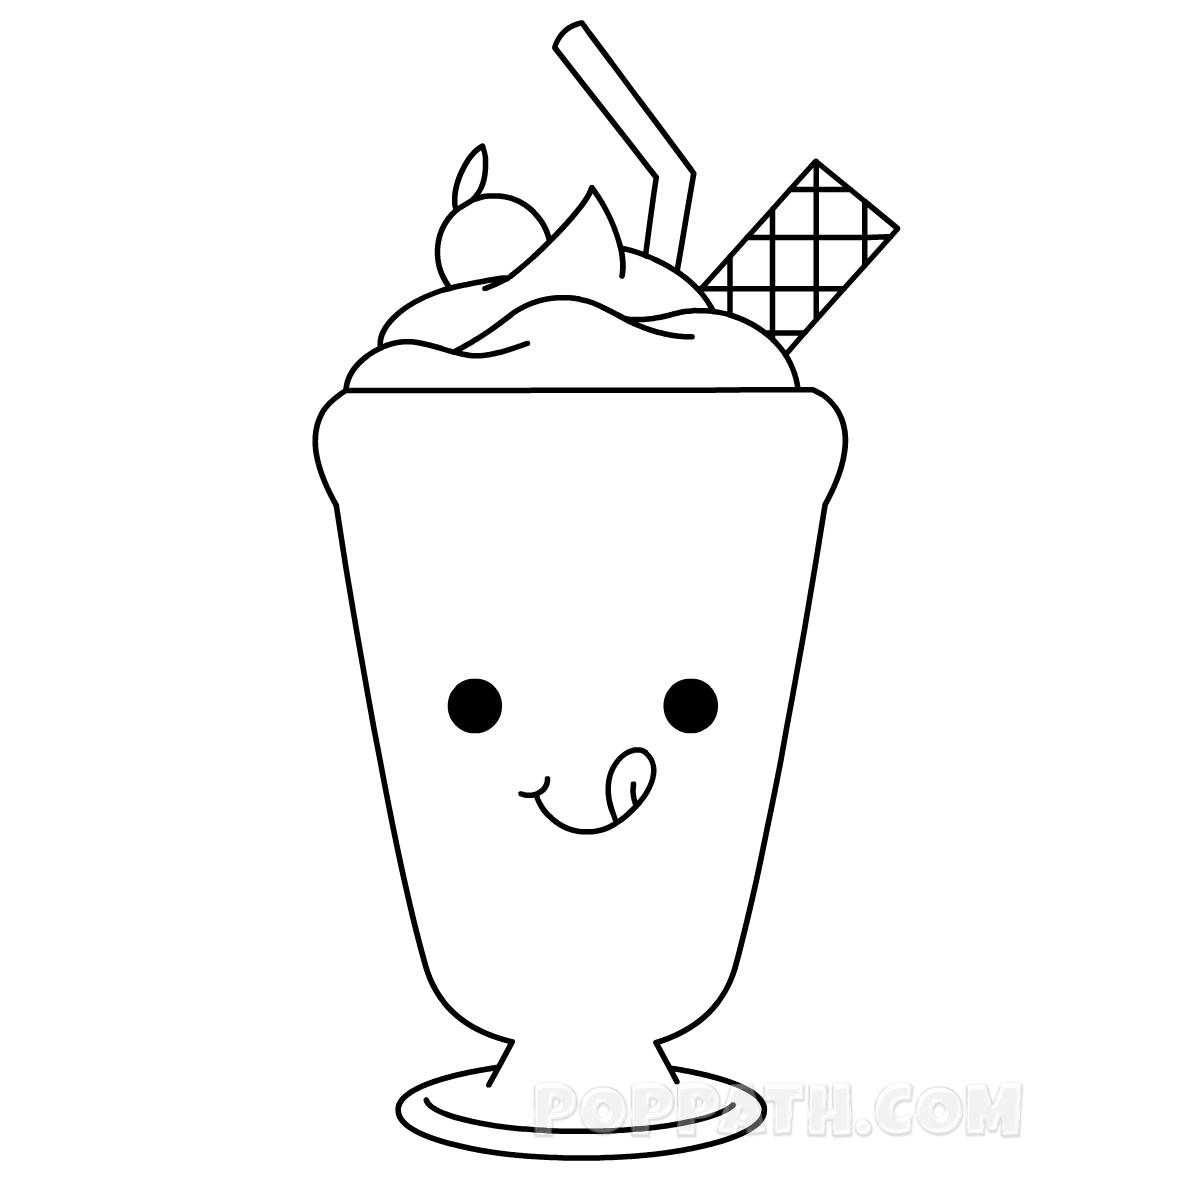 50s Milkshake Coloring Page